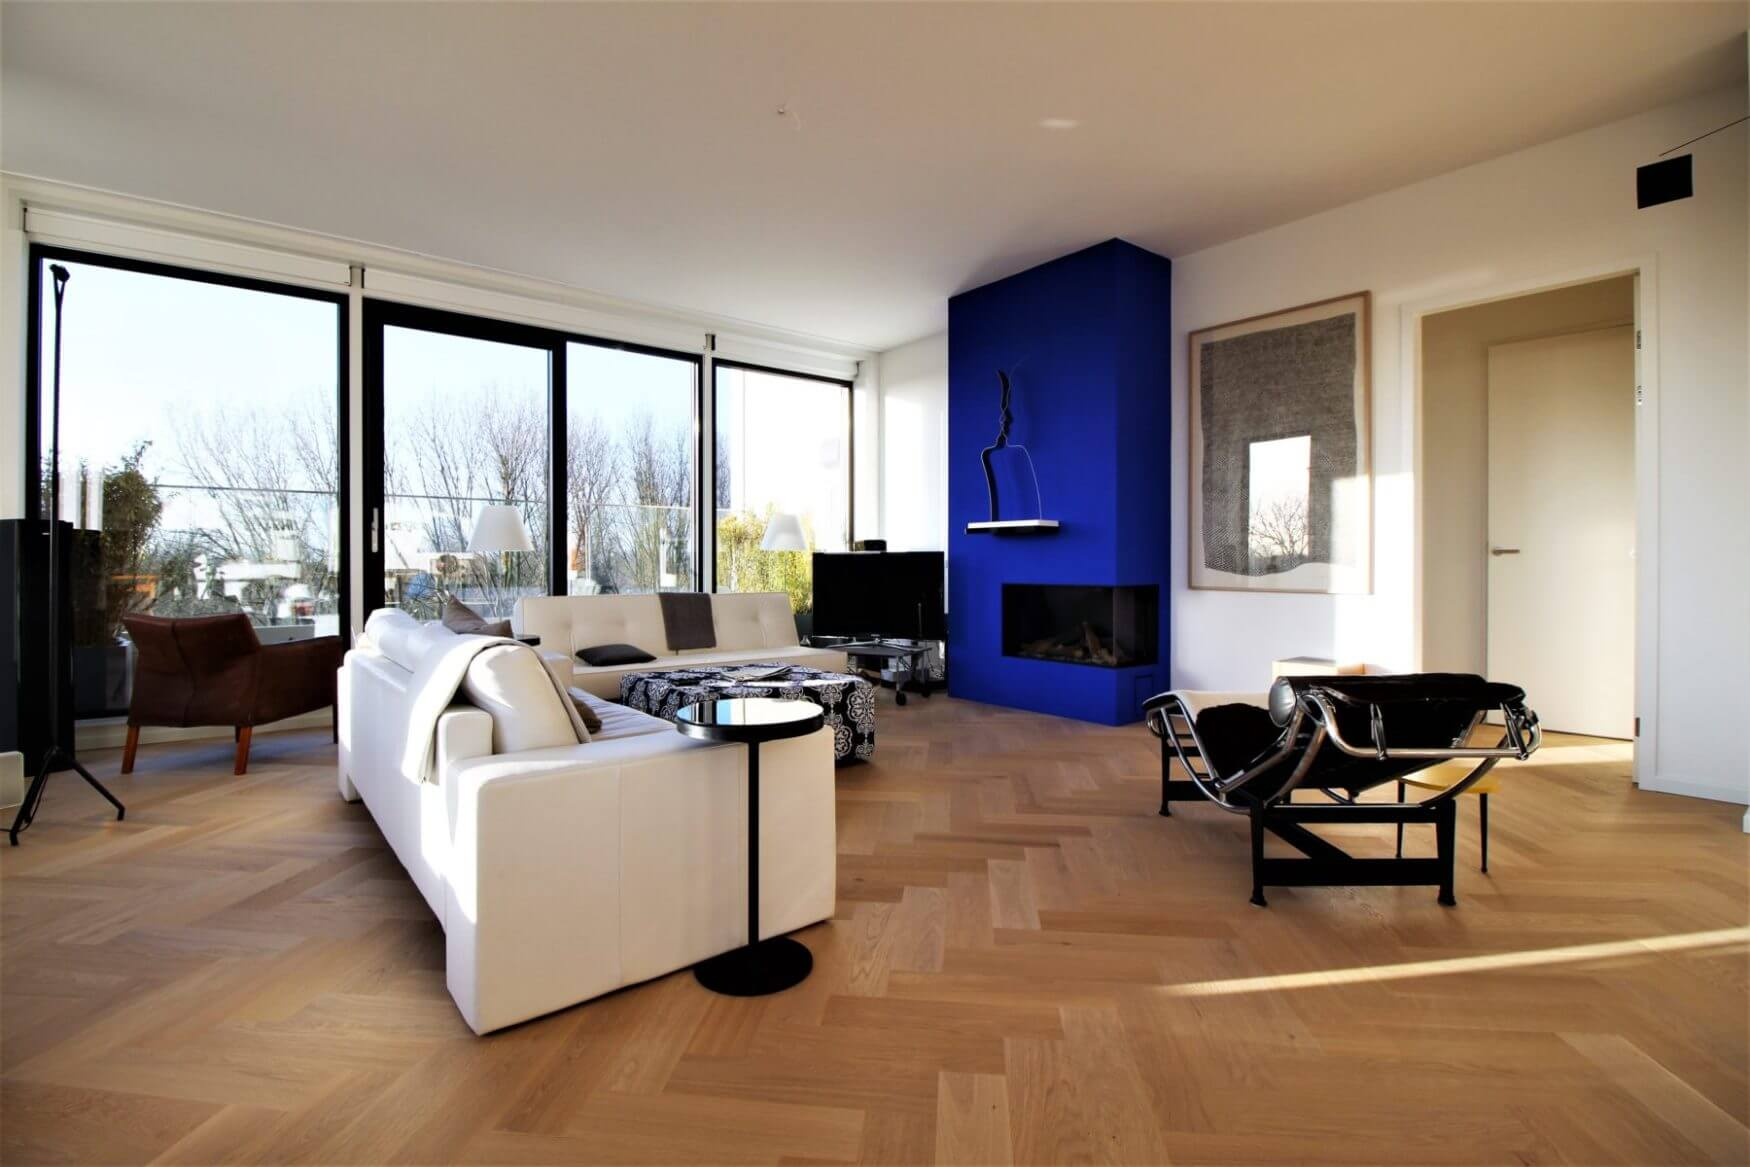 Bauwerk quadrato visgraat parket op vloerverwarming amsterdam